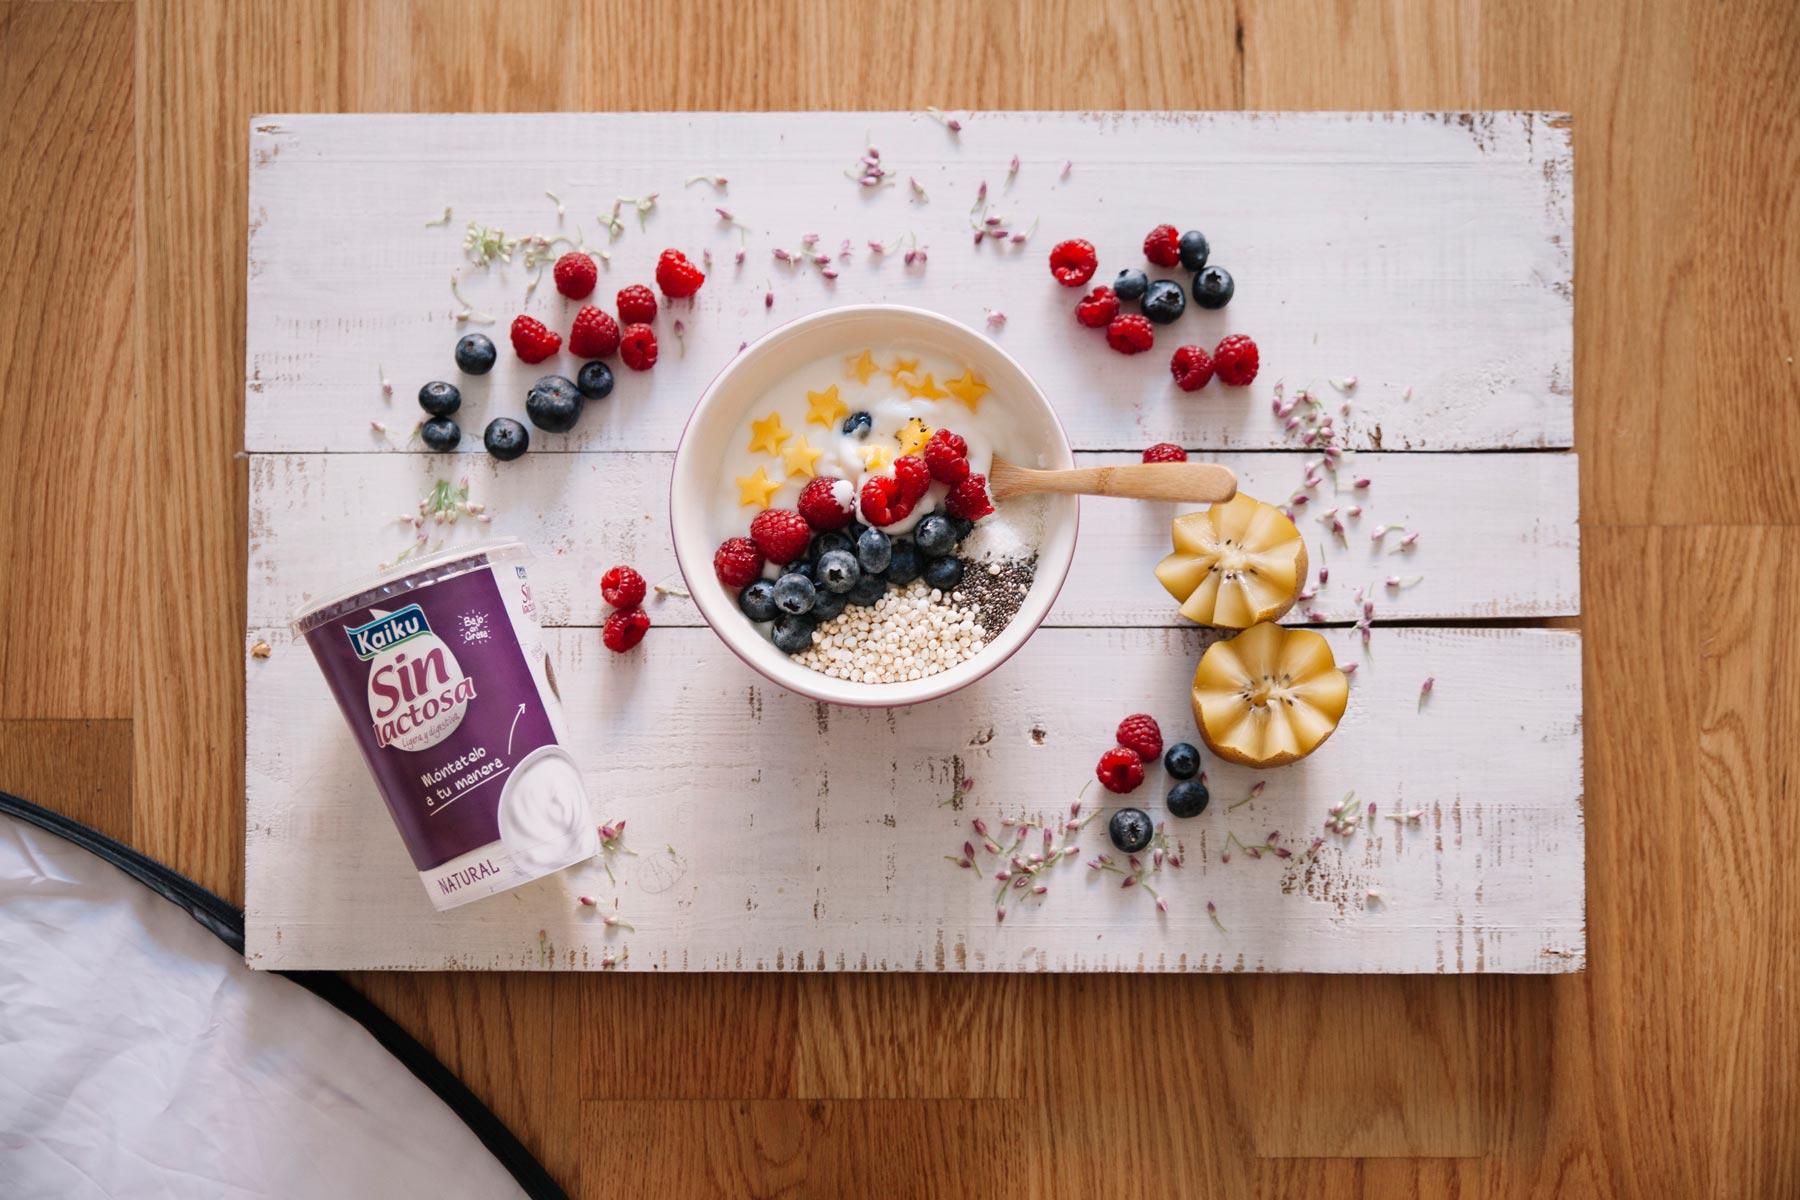 kaiku-sin-lactosa-como-hacer-buenas-fotos-comida